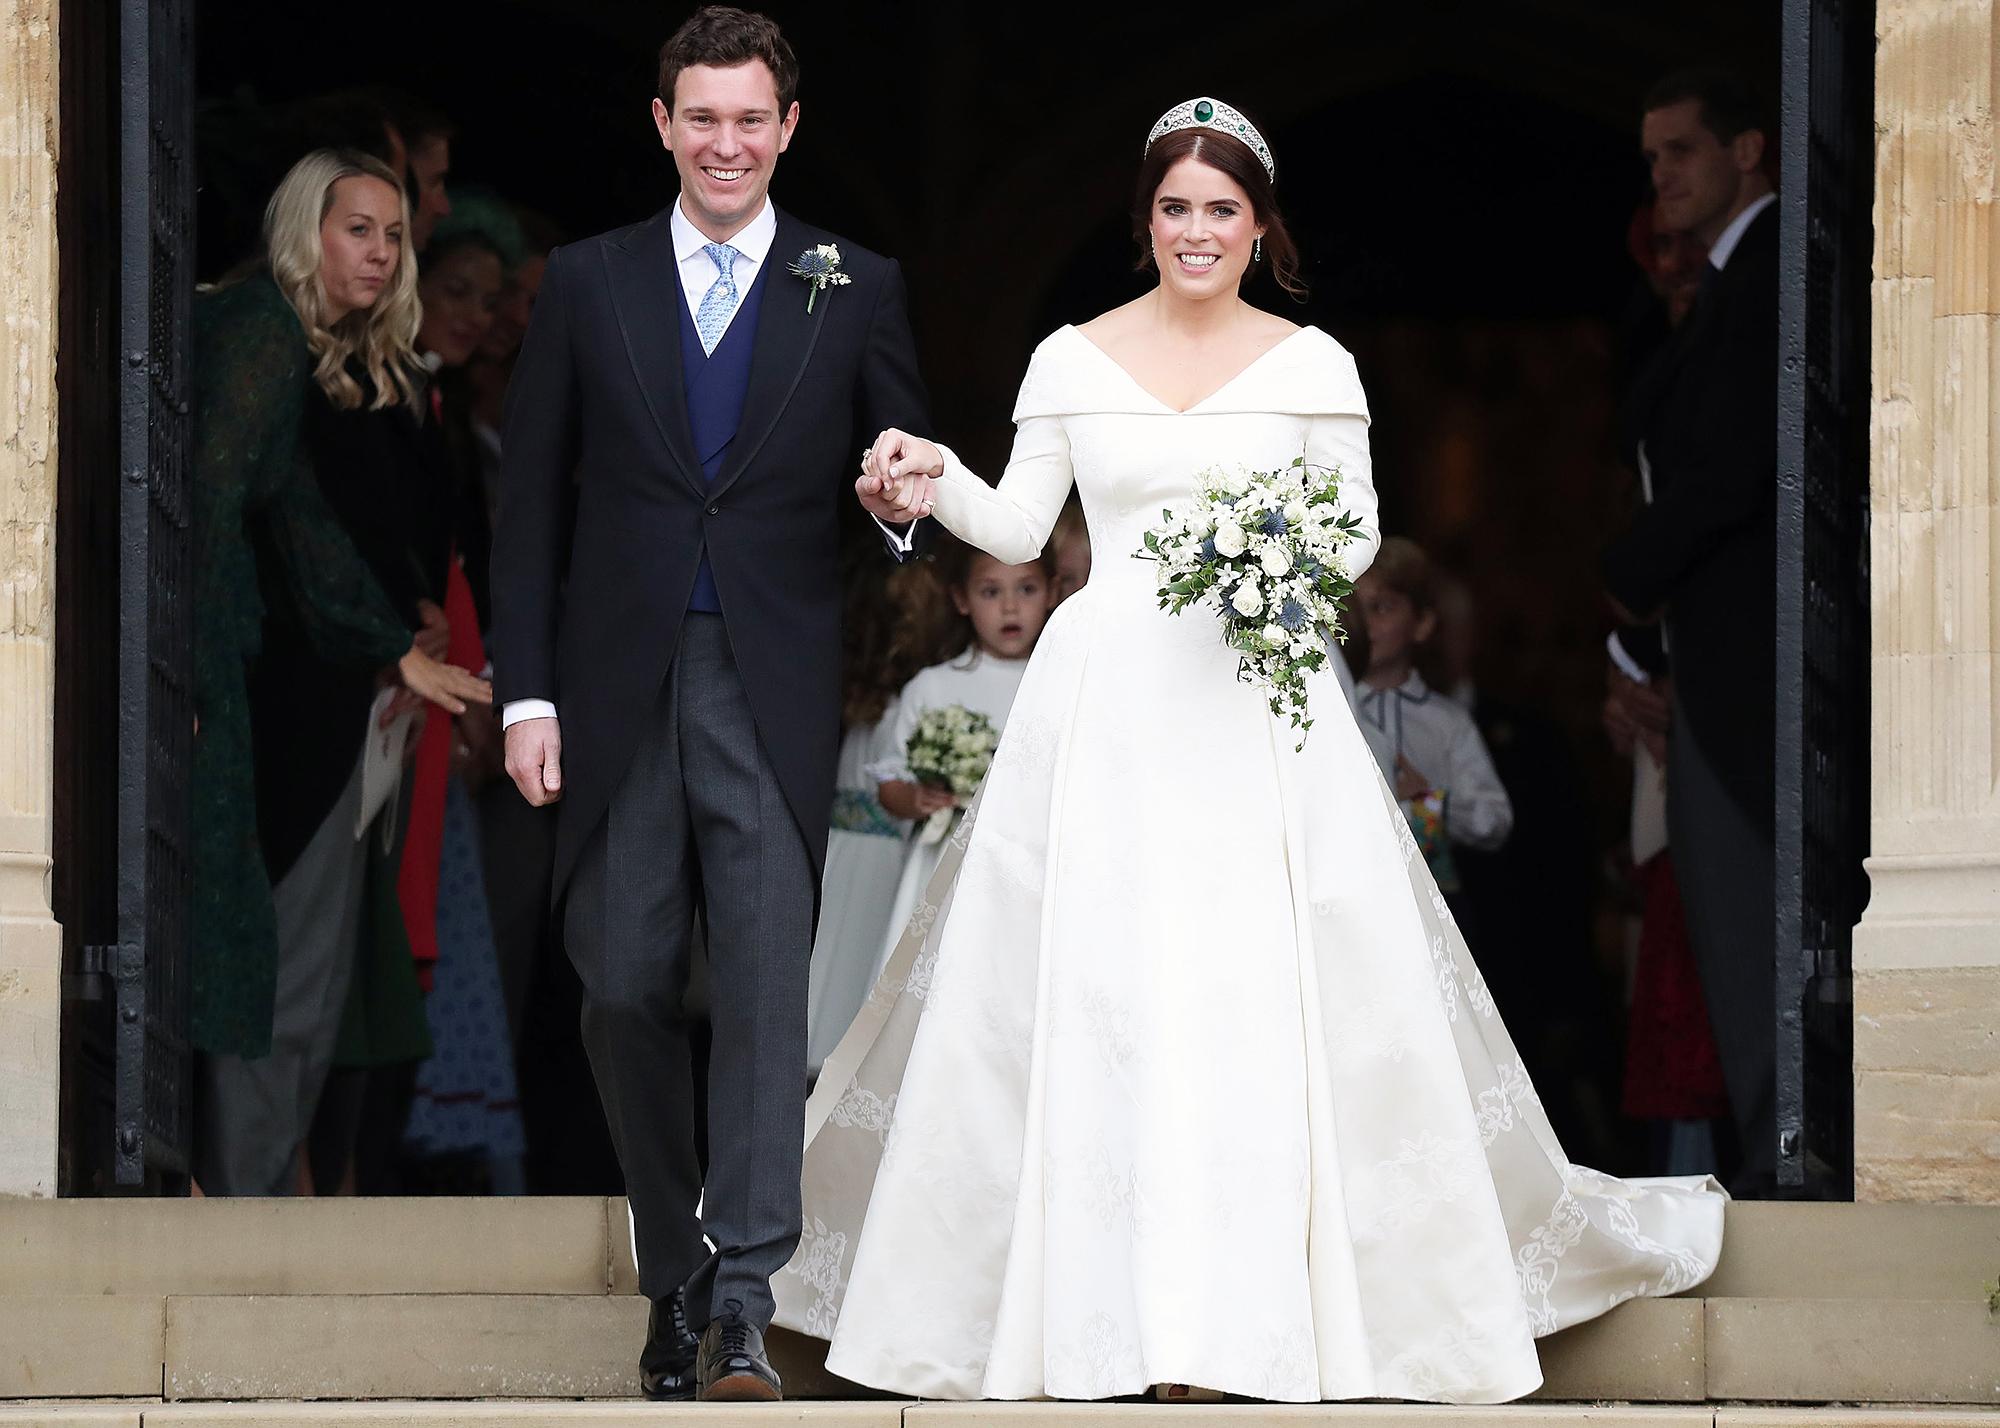 Chelsy Davy Cressida Bonas Princess Eugenie Wedding Prince Harry Ex